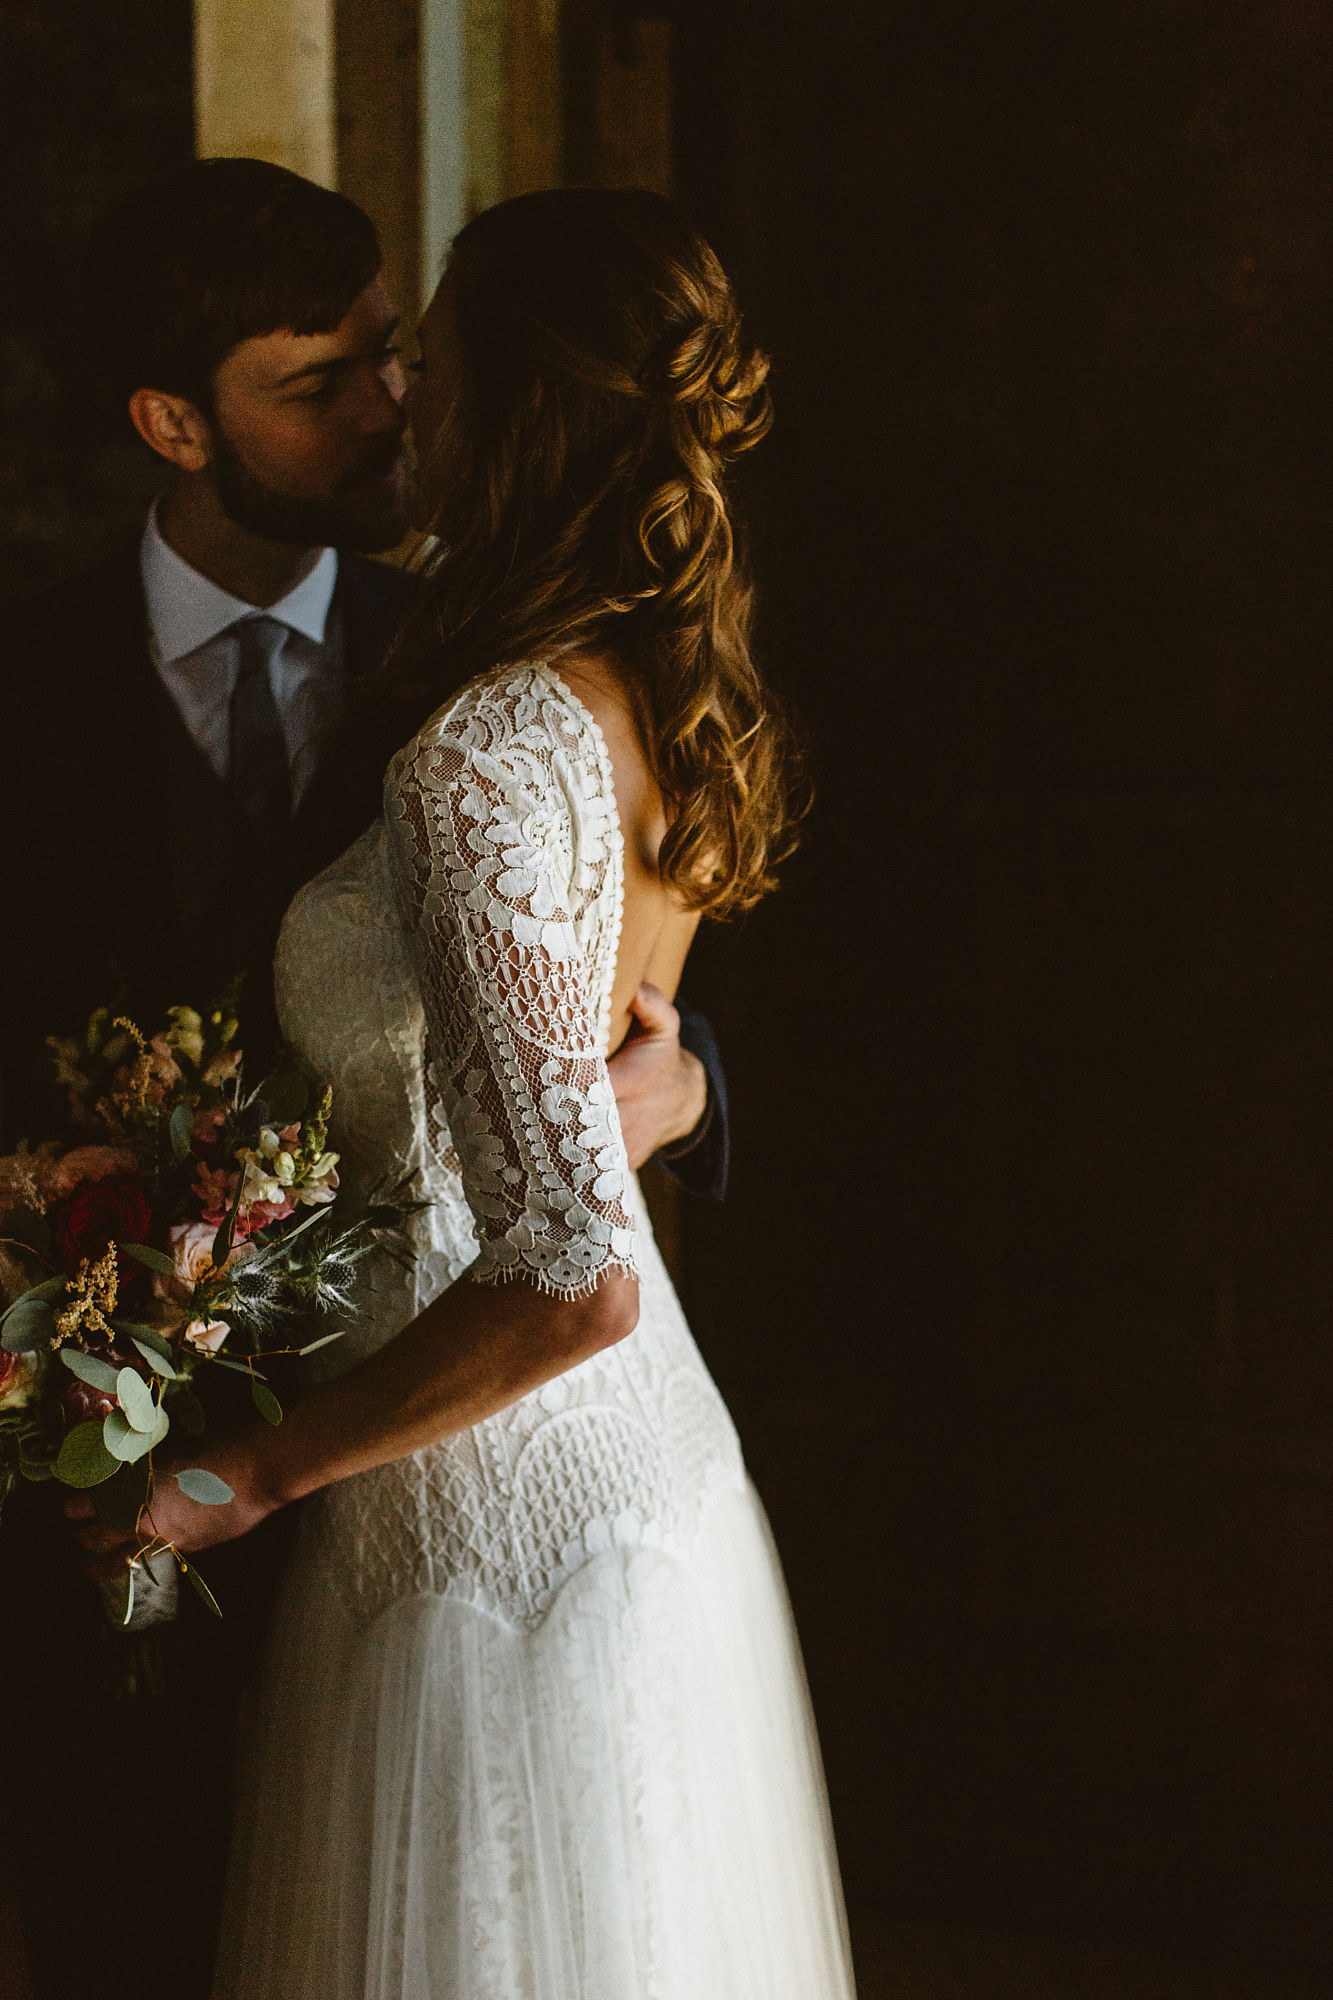 jessica_austin_oasis_brewery_wedding_photos133402.jpg